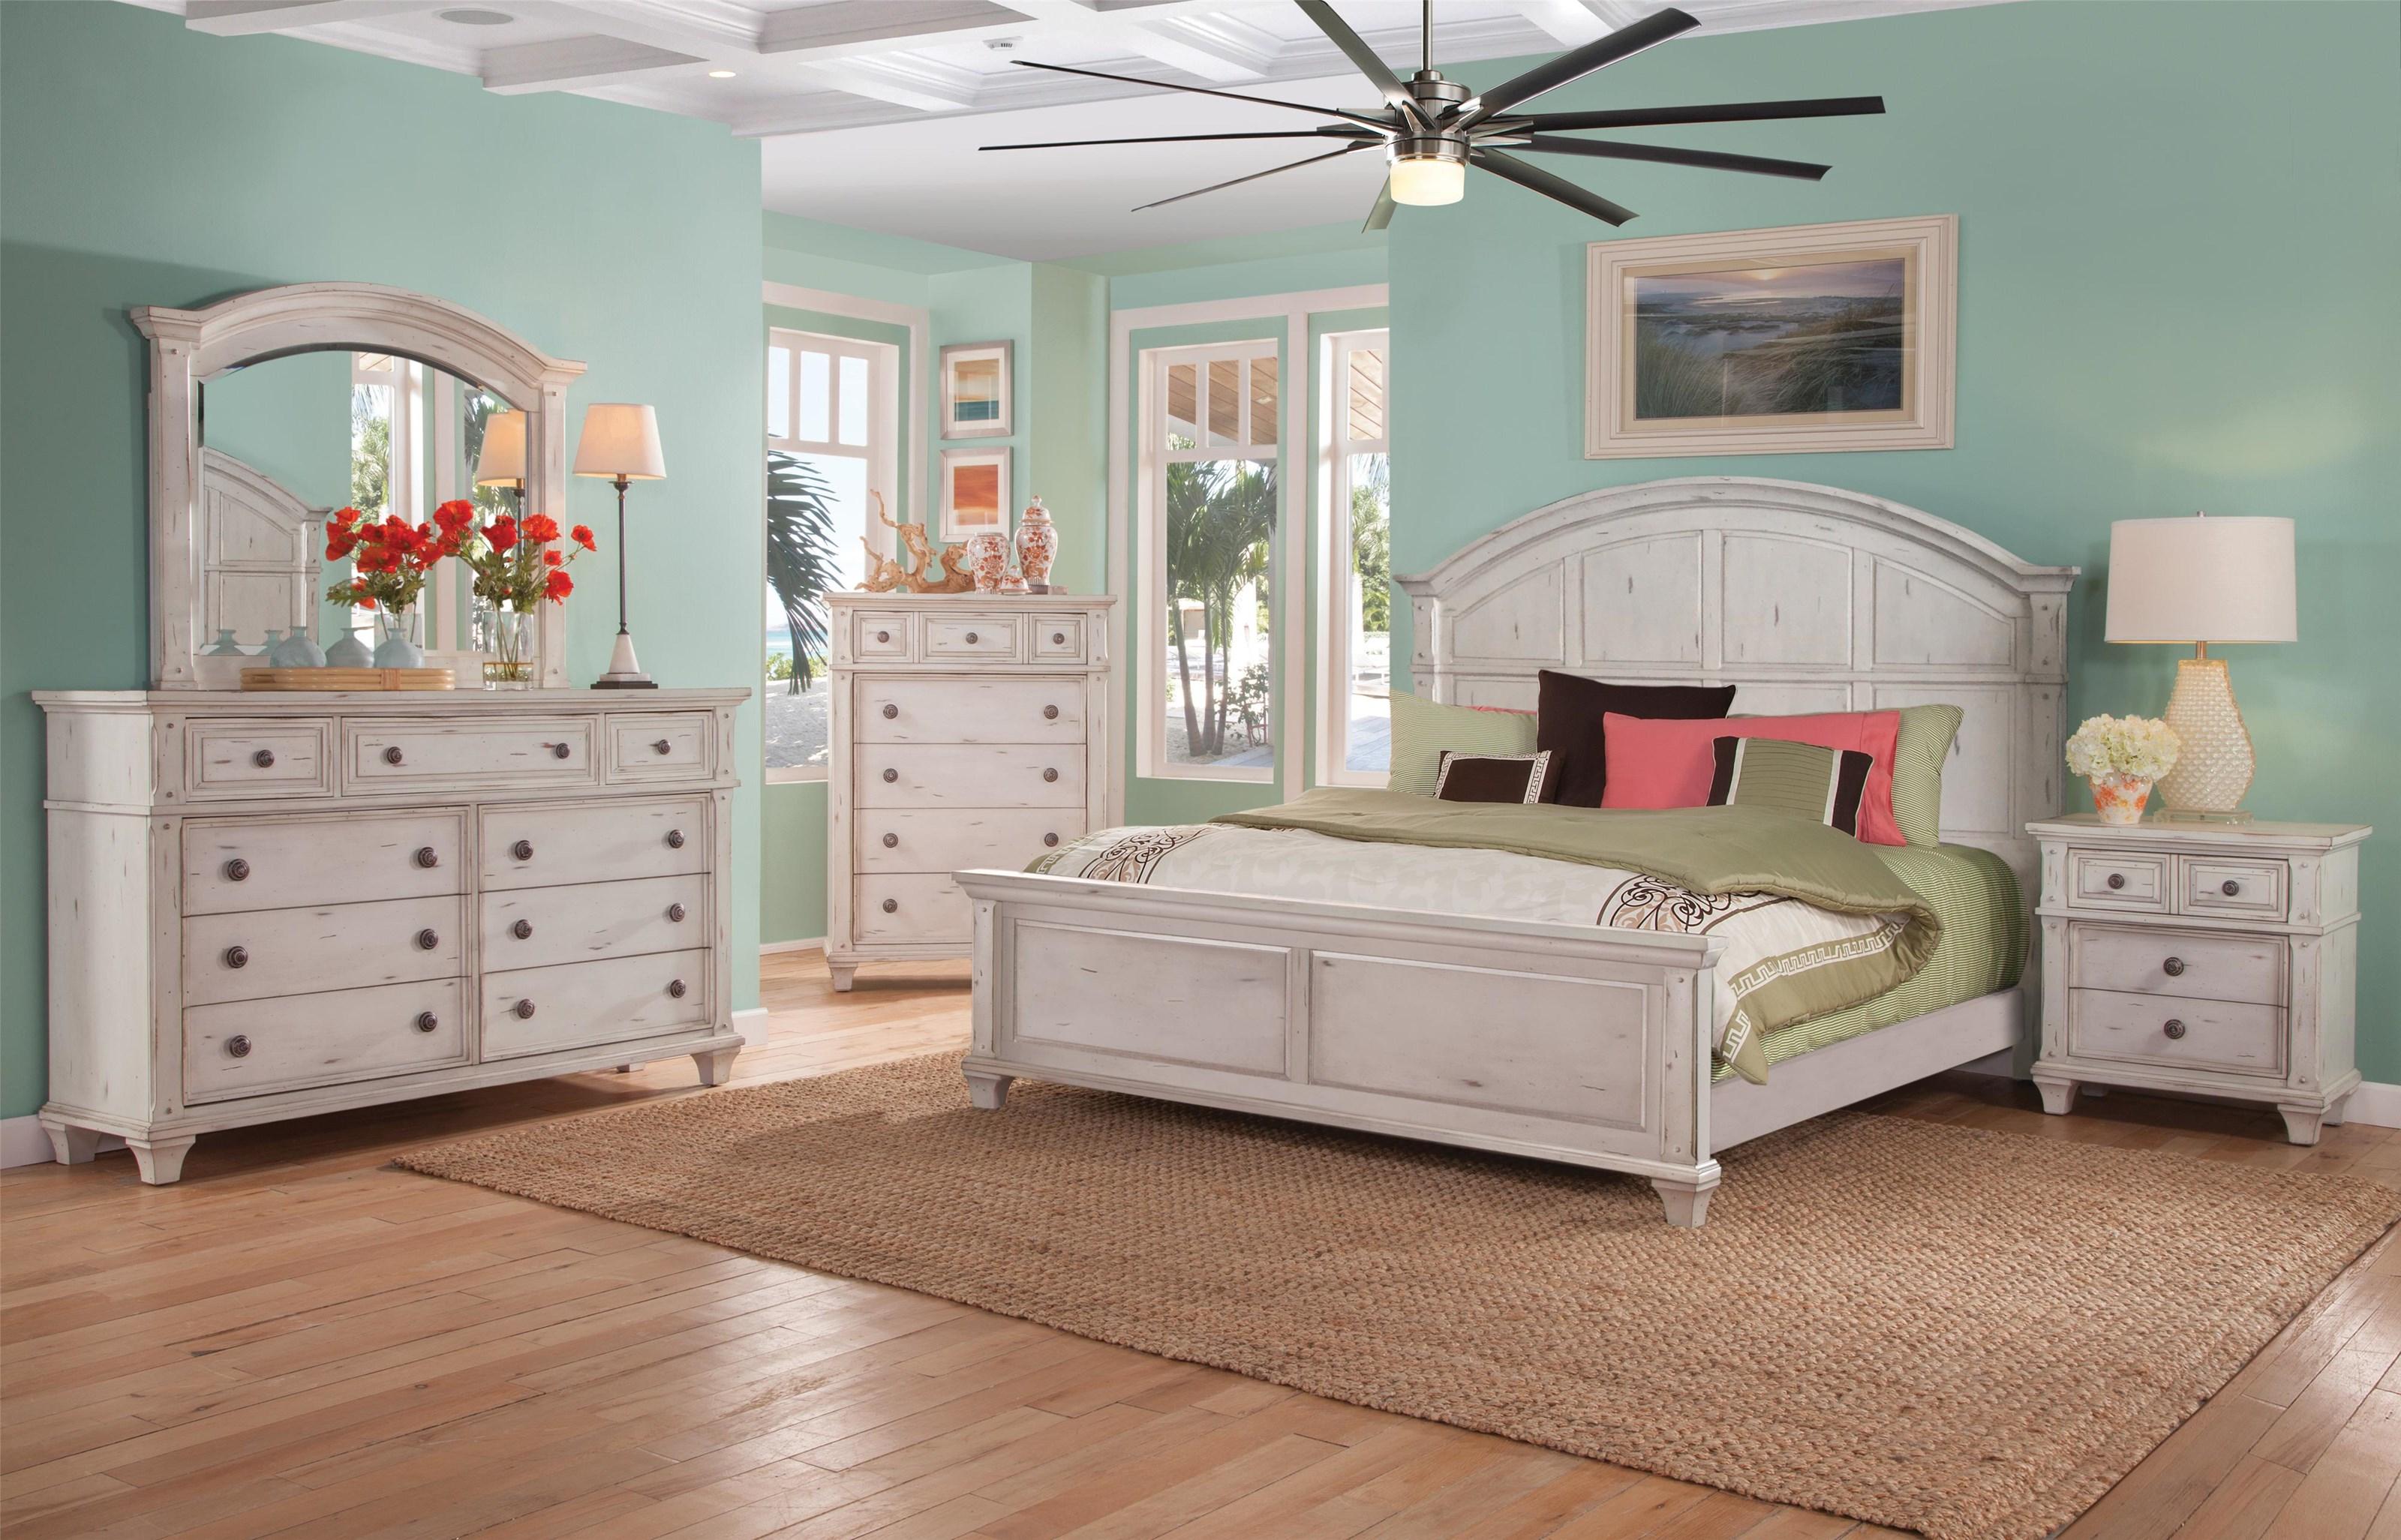 American Woodcrafters Sedona King Panel Bed, Dresser, Mirror, Nightstand - Item Number: 9930443